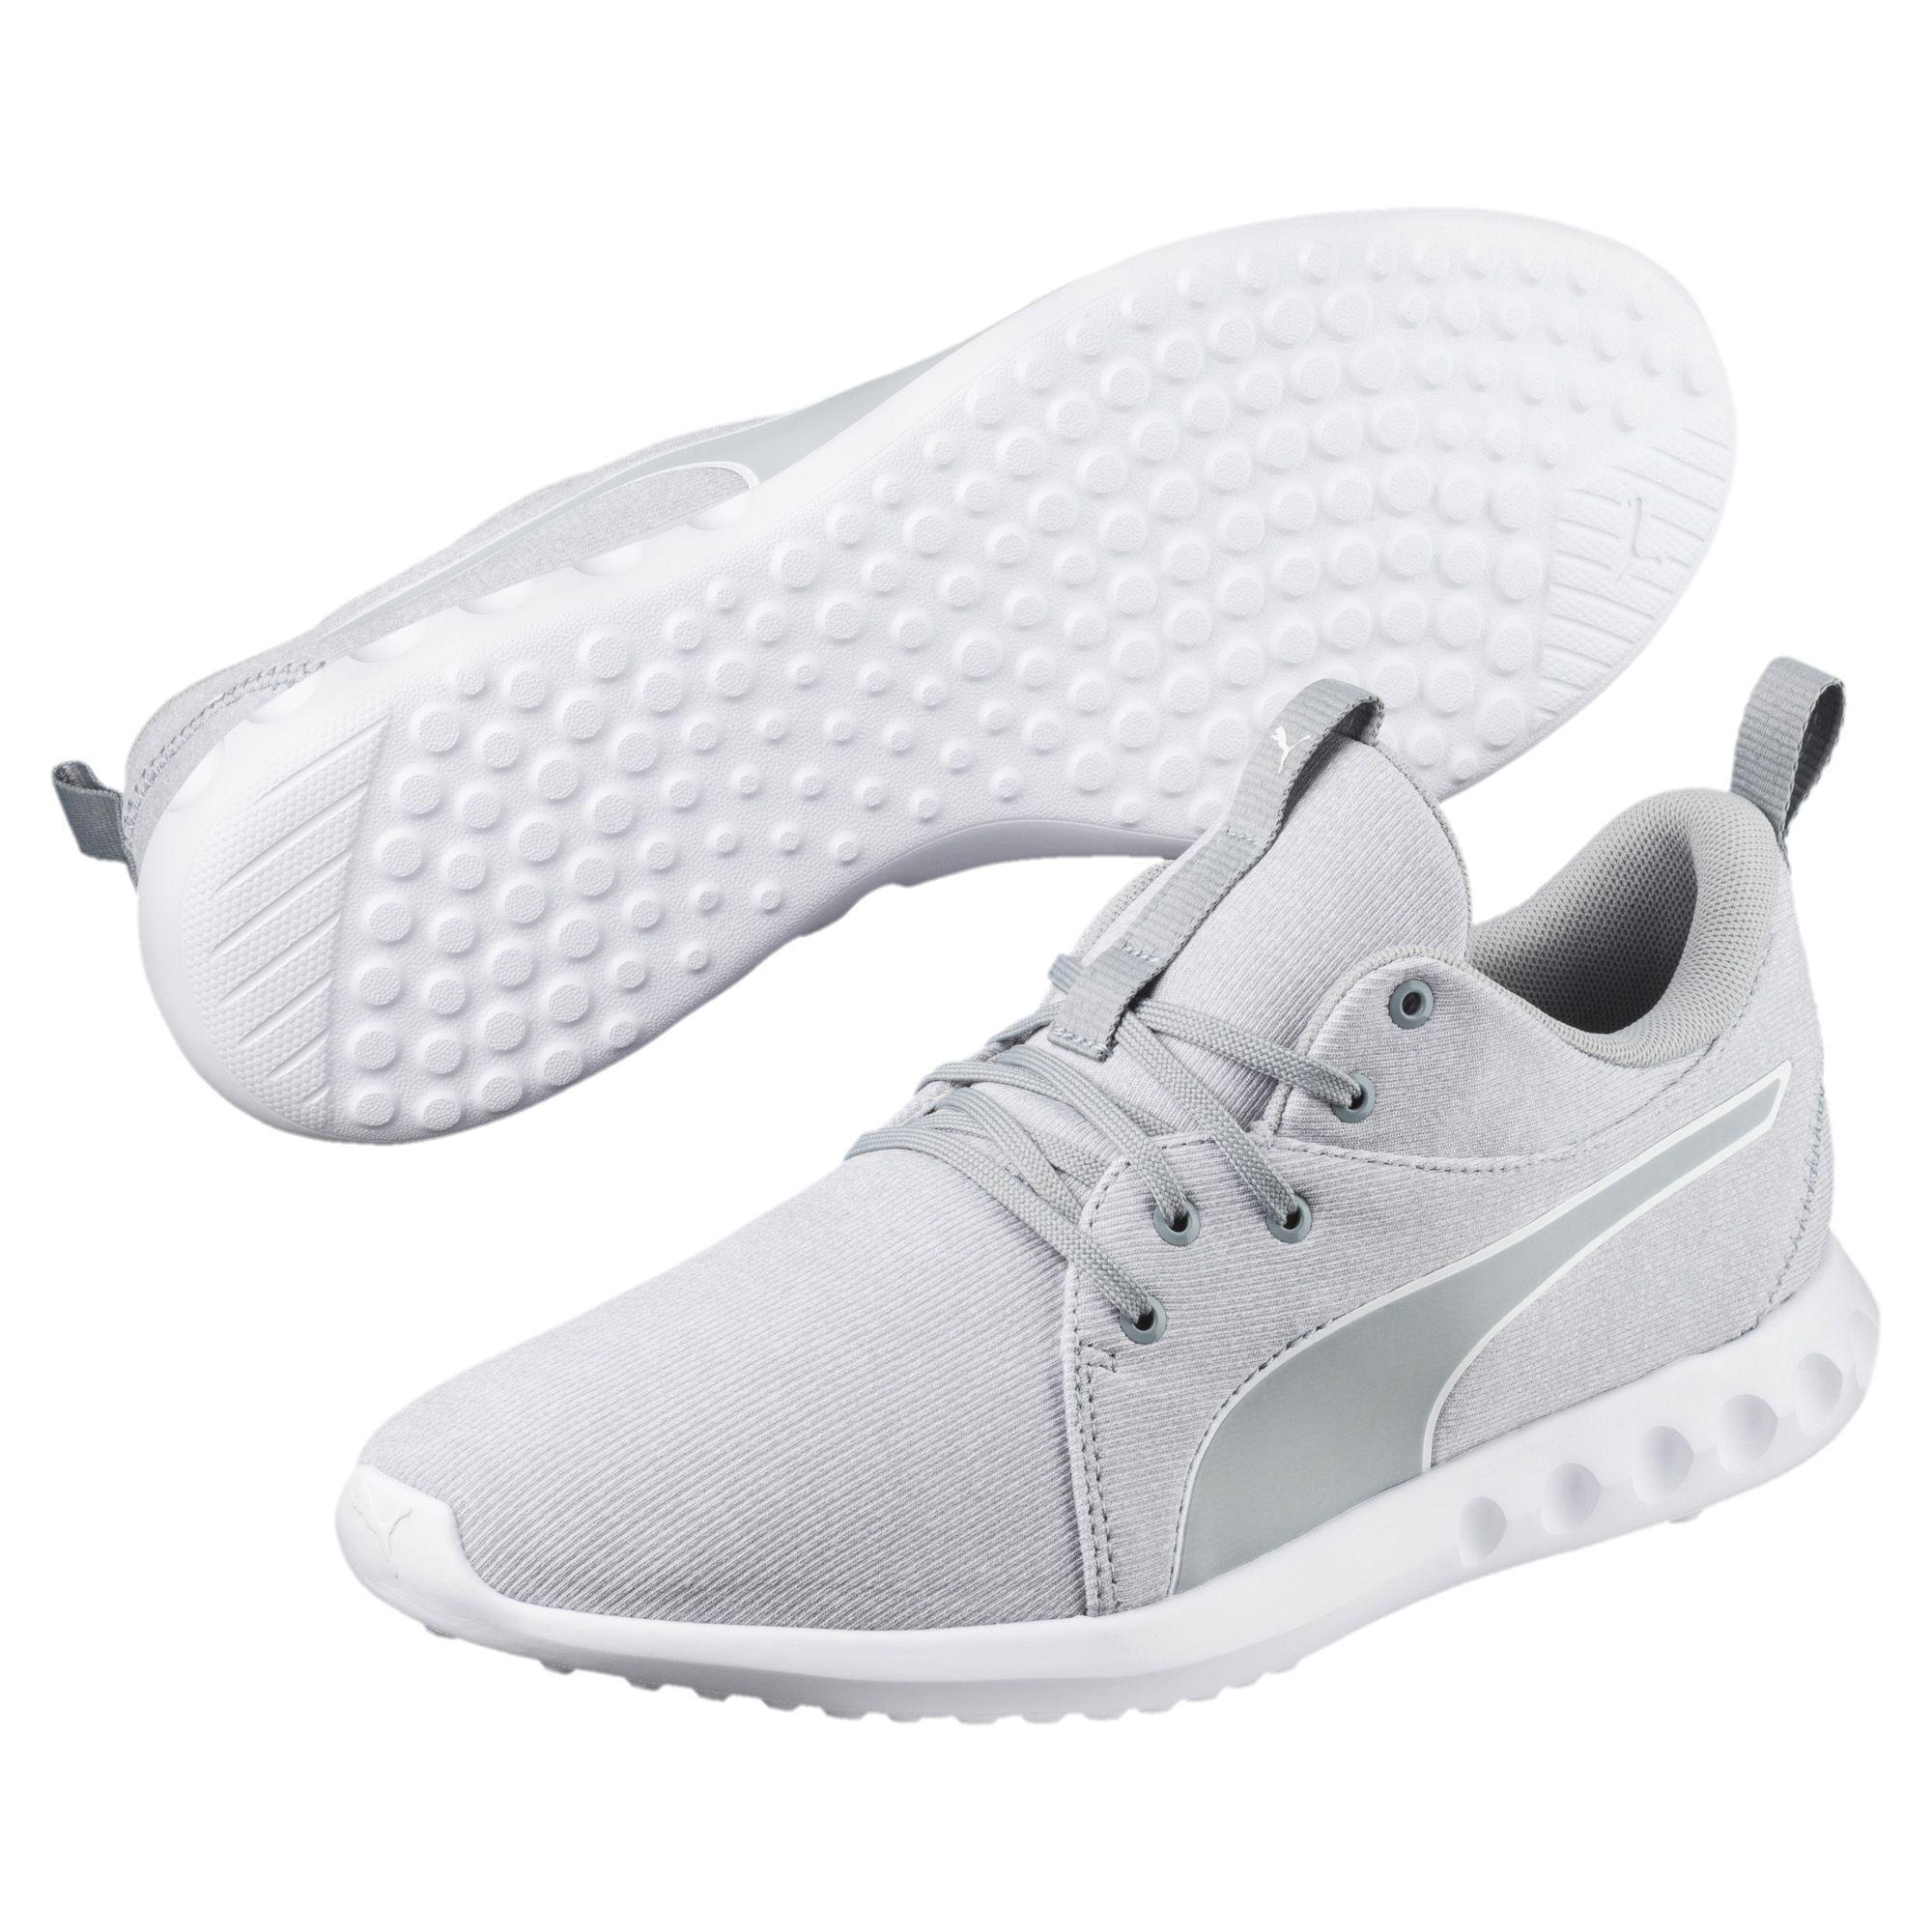 PUMA - White Carson 2 Men s Nautical Running Shoes for Men - Lyst. View  fullscreen a89359f68